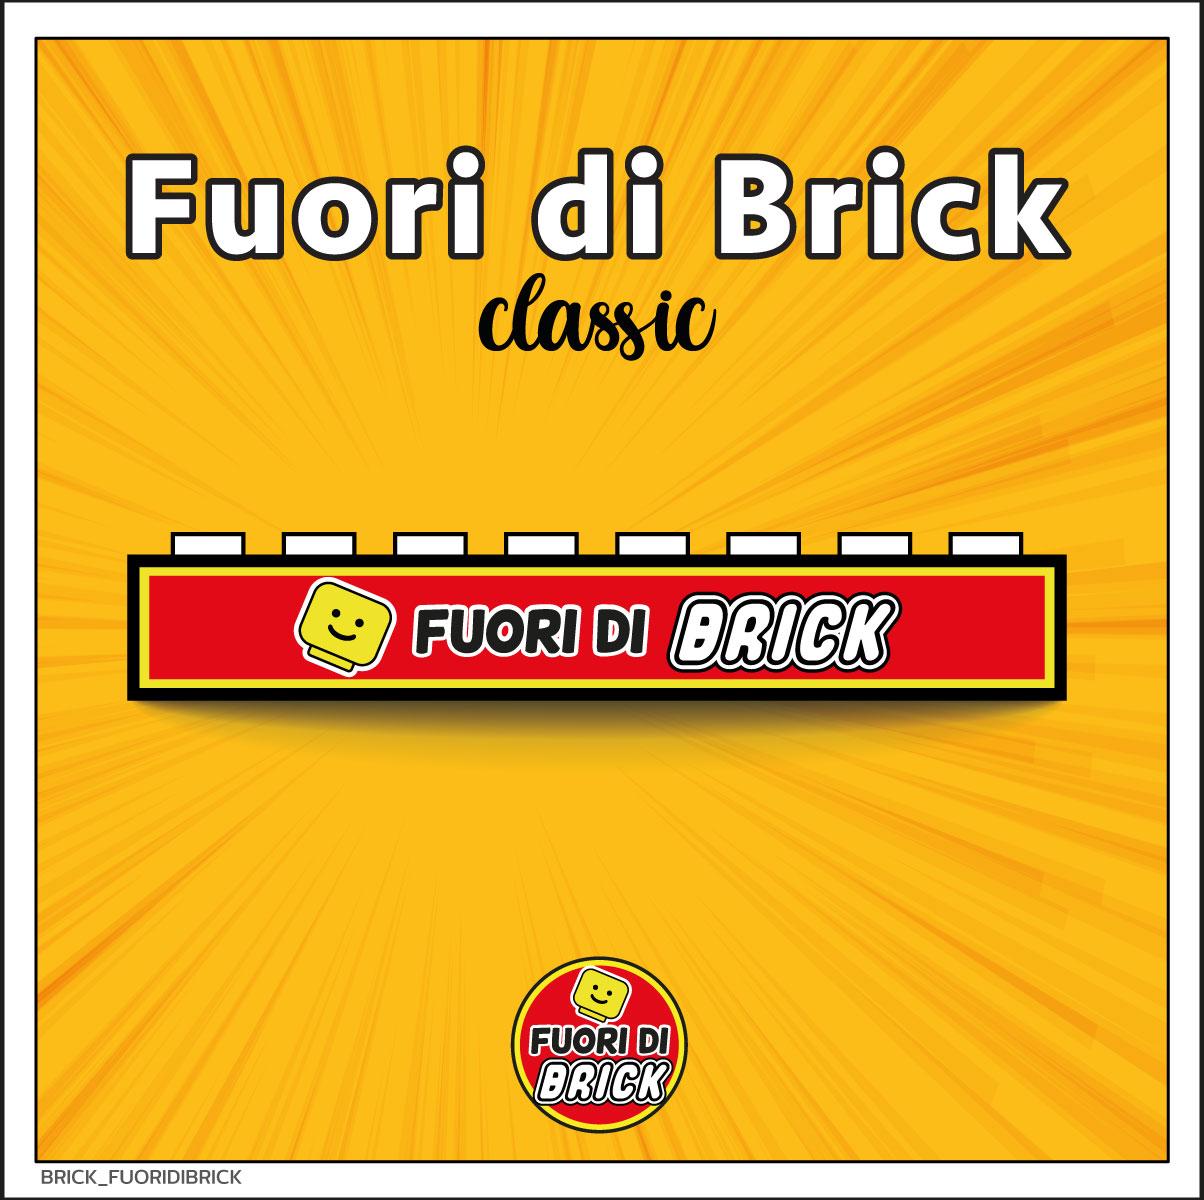 BRICK 1X8_FUORI DI BRICK_CLASSIC